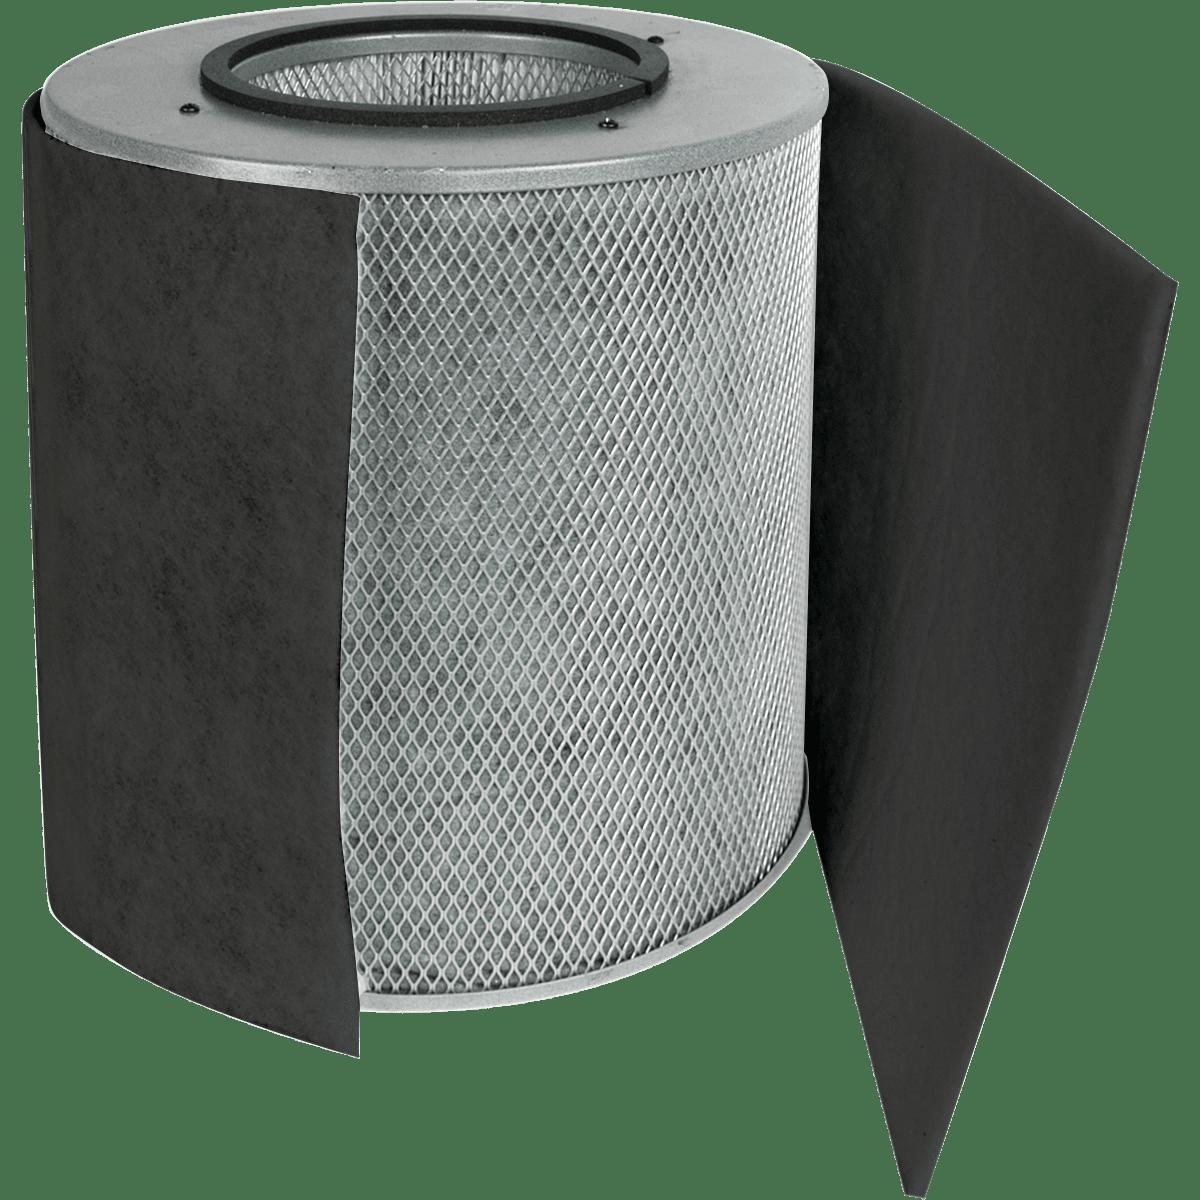 Austin Air Healthmate Plus Jr Replacement Filter W